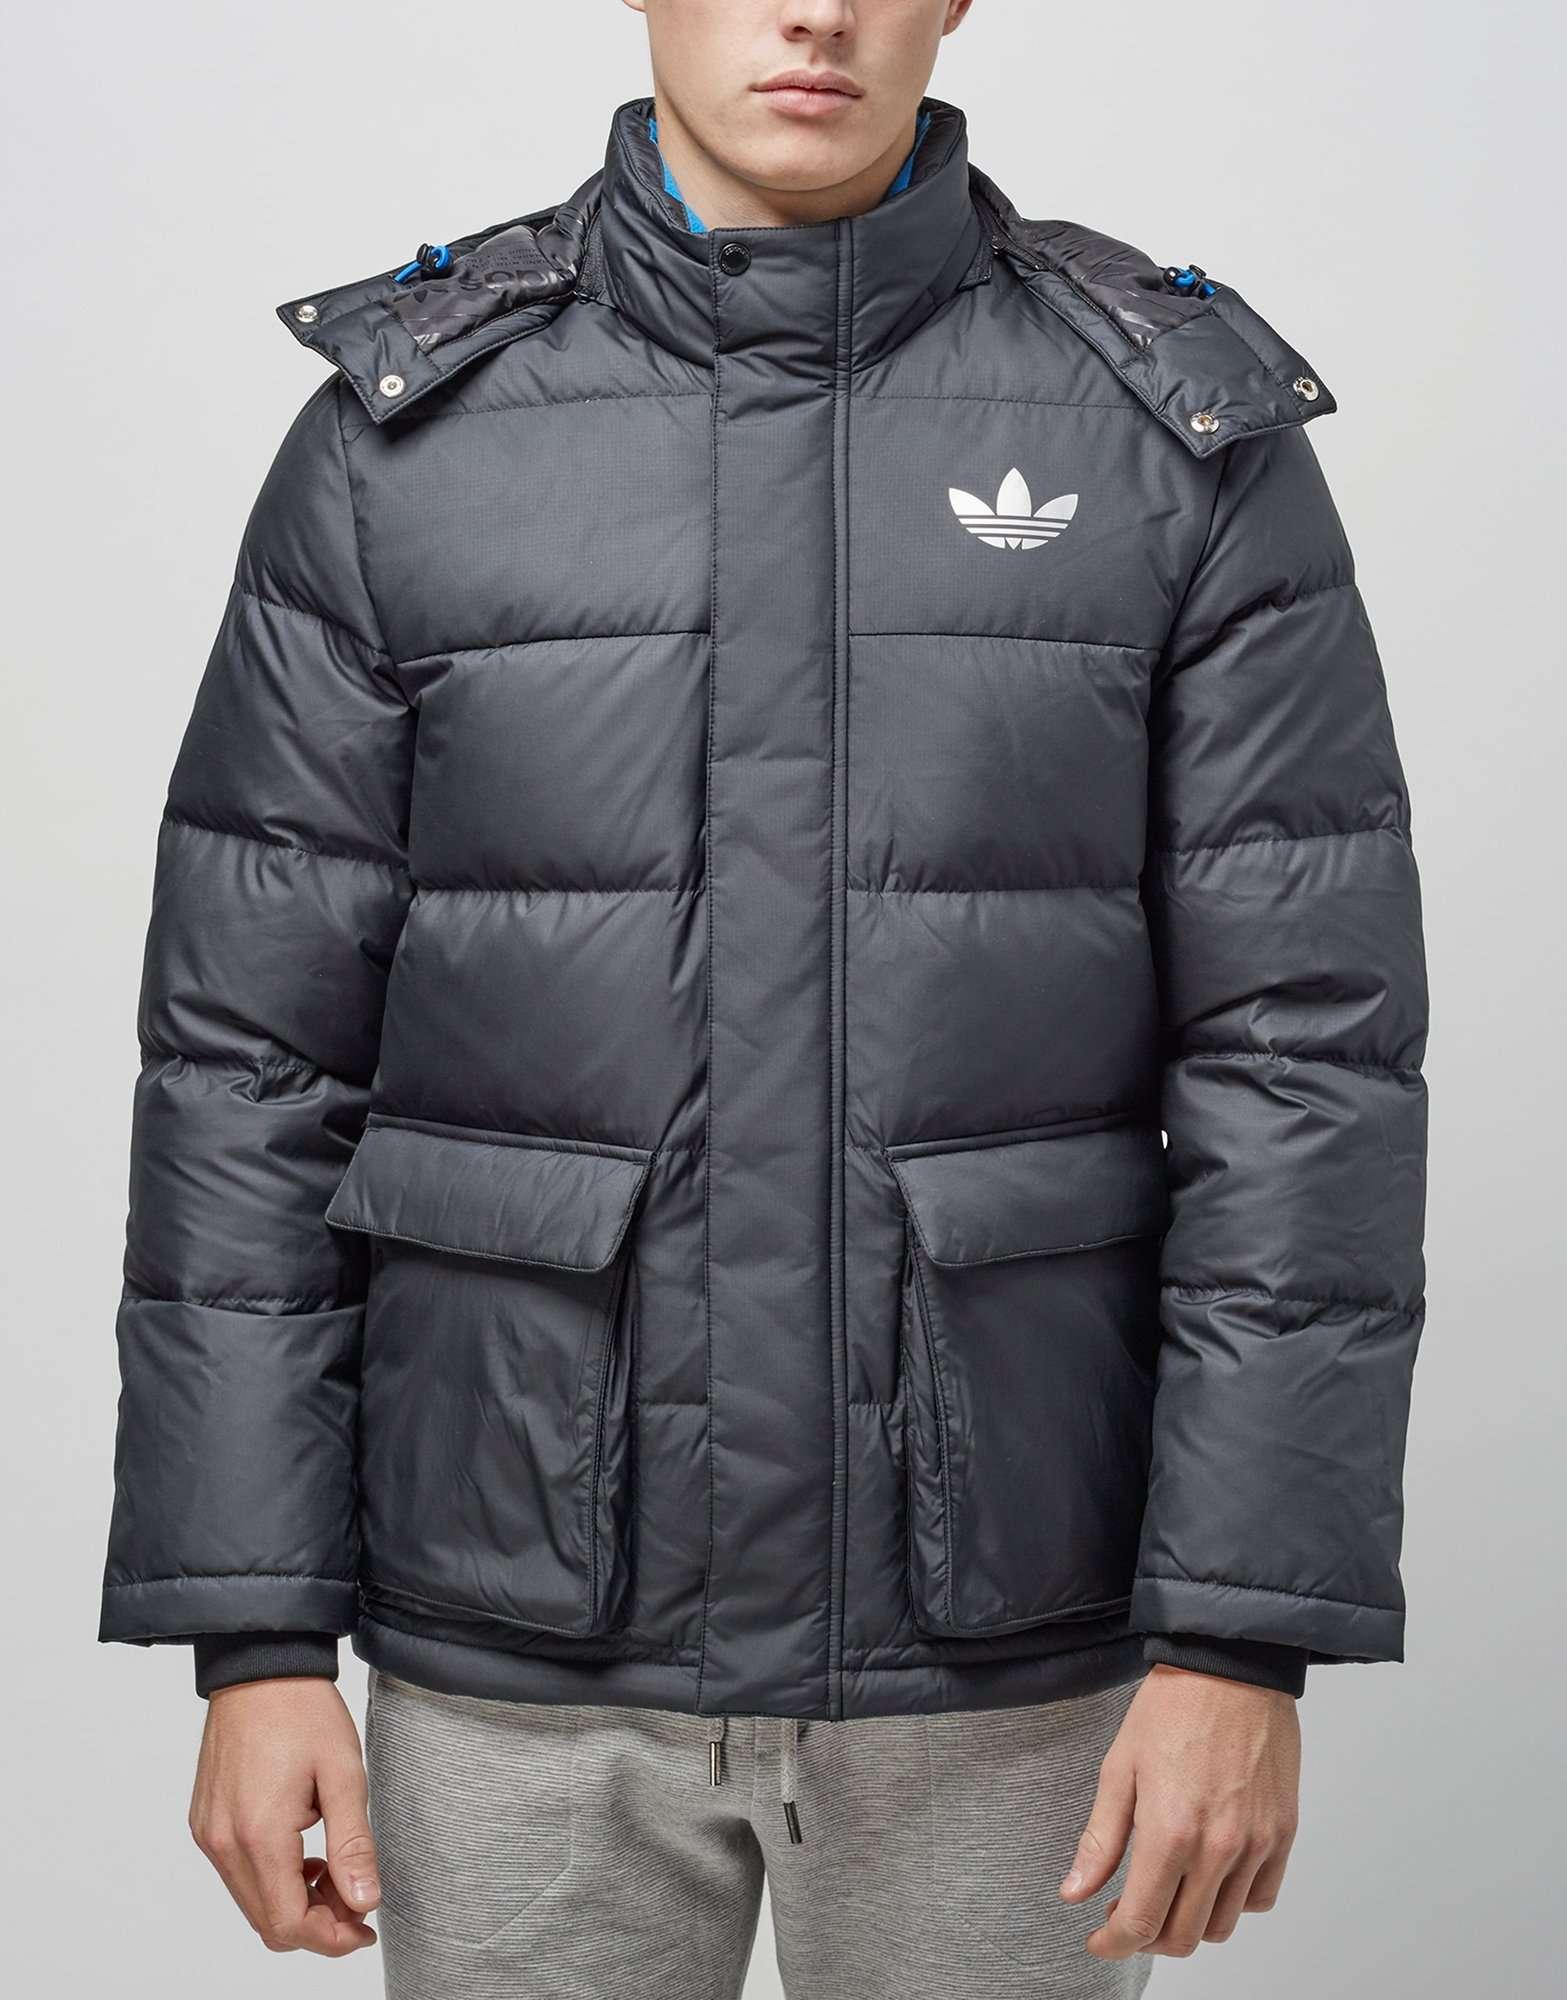 Adidas praez Originals chaqueta con capucha praez Adidas Scotts hombre wear 2e79dd